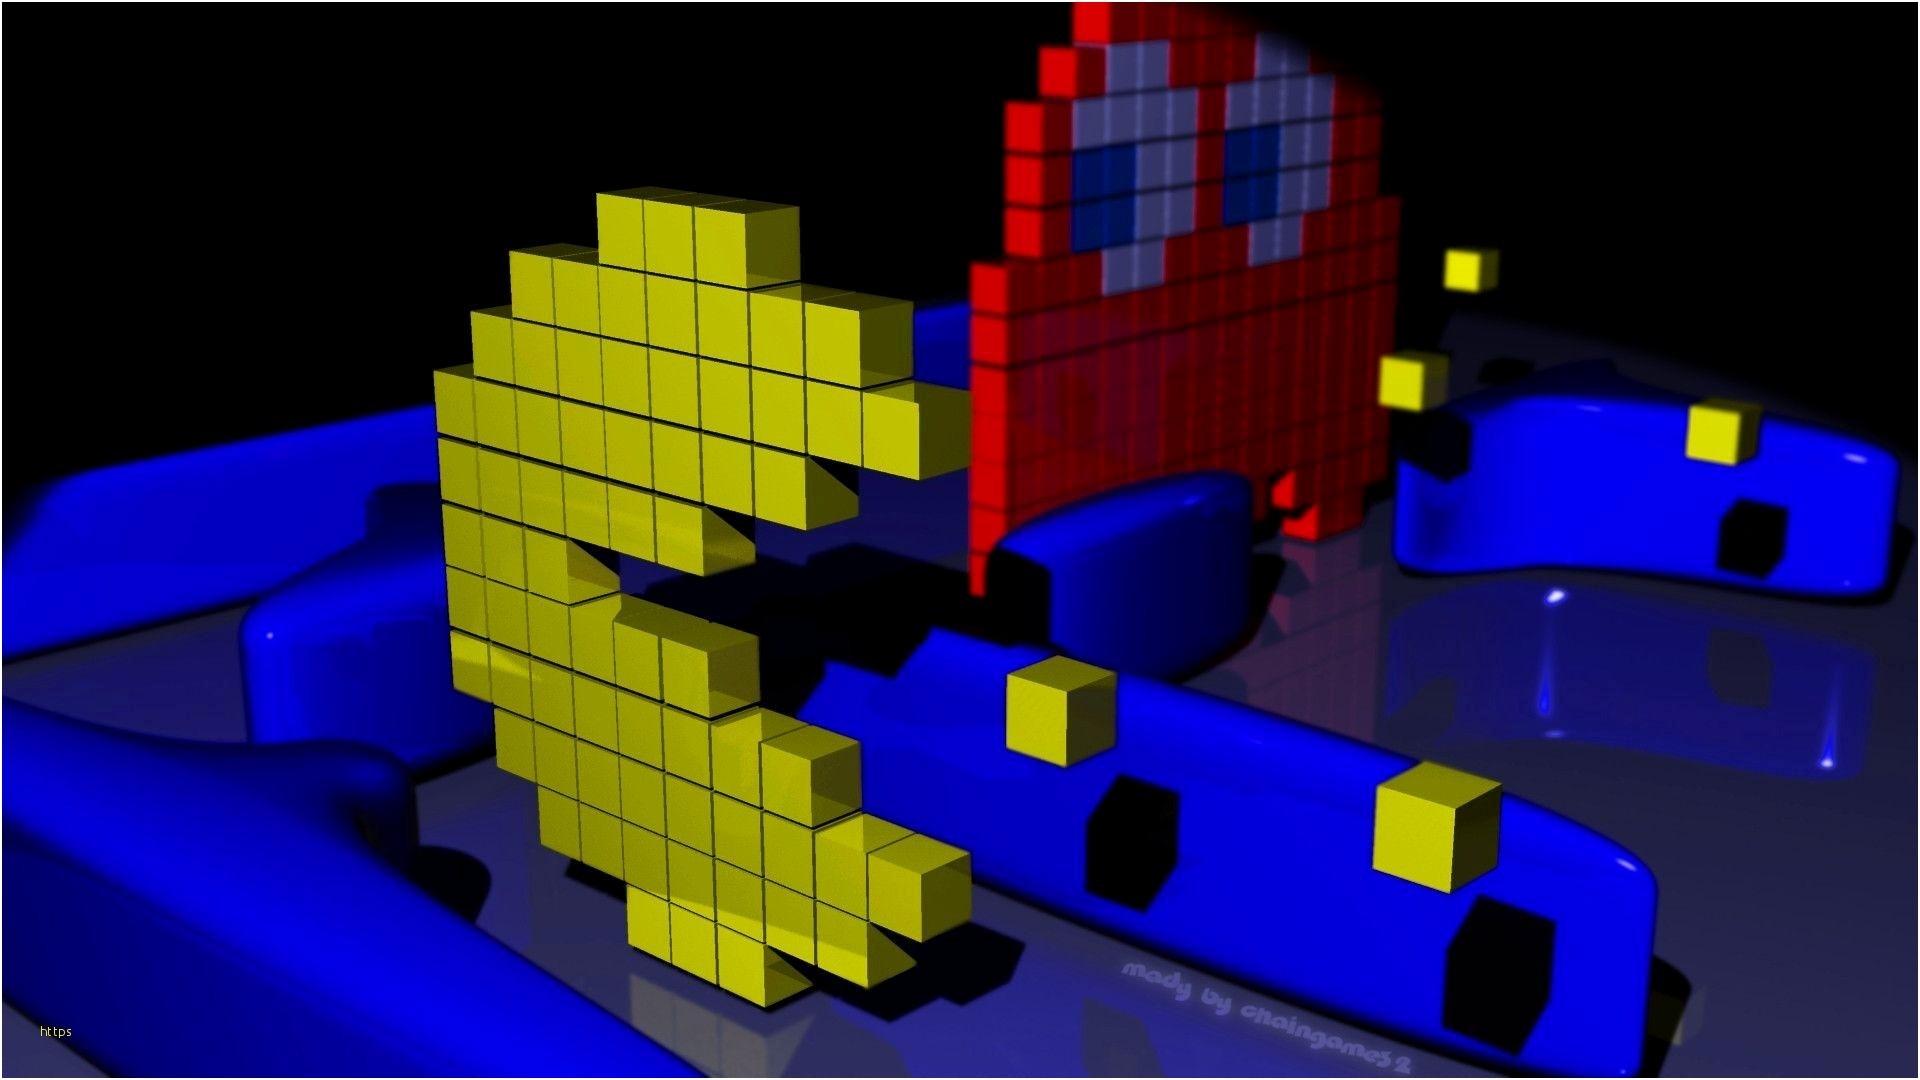 Res: 1920x1080, Pacman Wallpaper Inspirational Pacman Wallpapers Wallpaper Cave